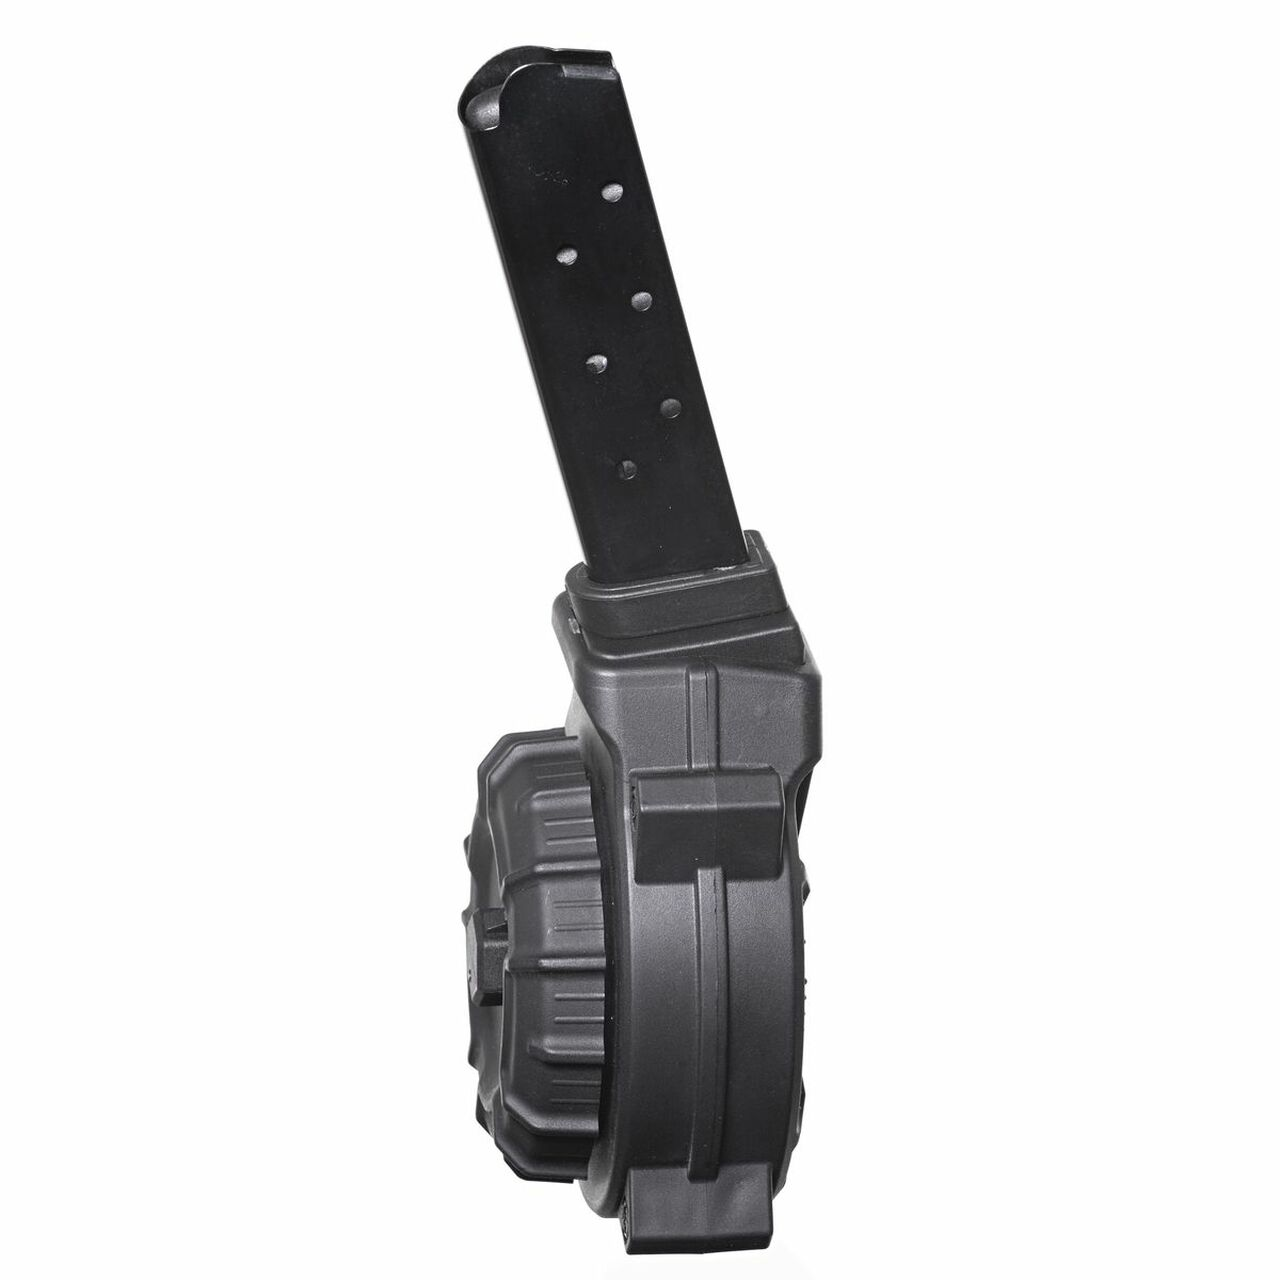 Smith & Wesson® Shield™ 9mm (30) Rd - Black Polymer Drum